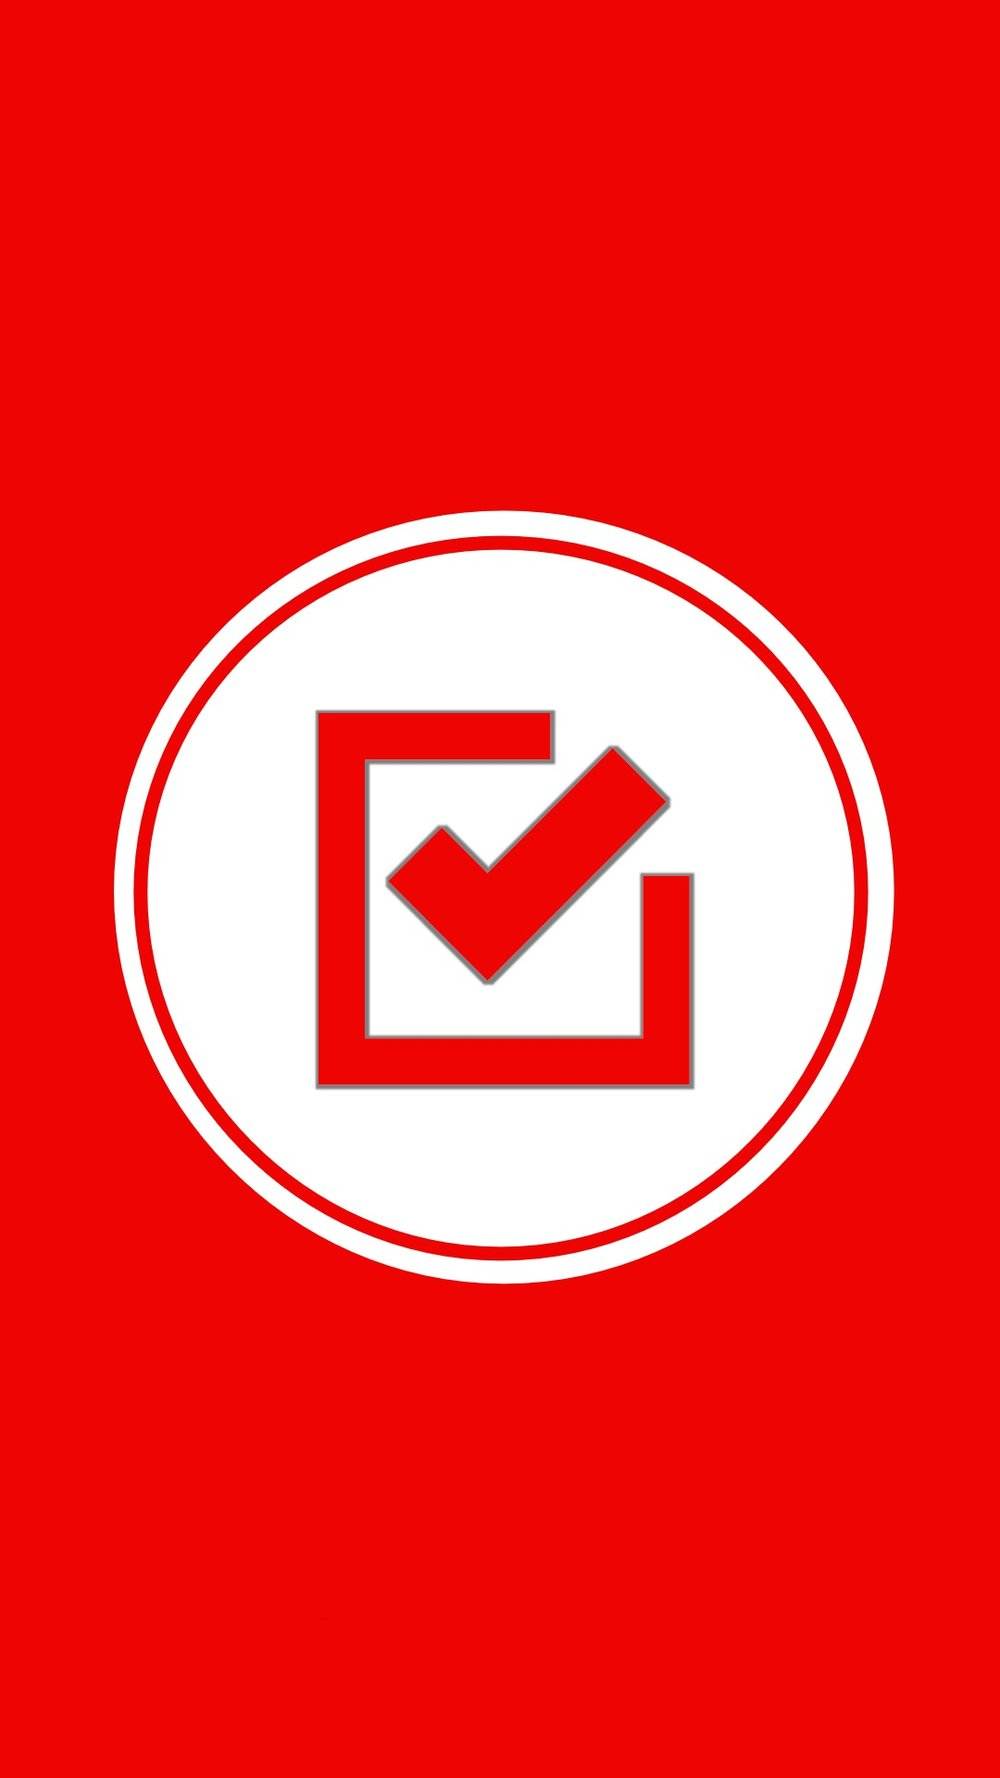 Instagram-cover-task-red-lotnotes.com.jpg